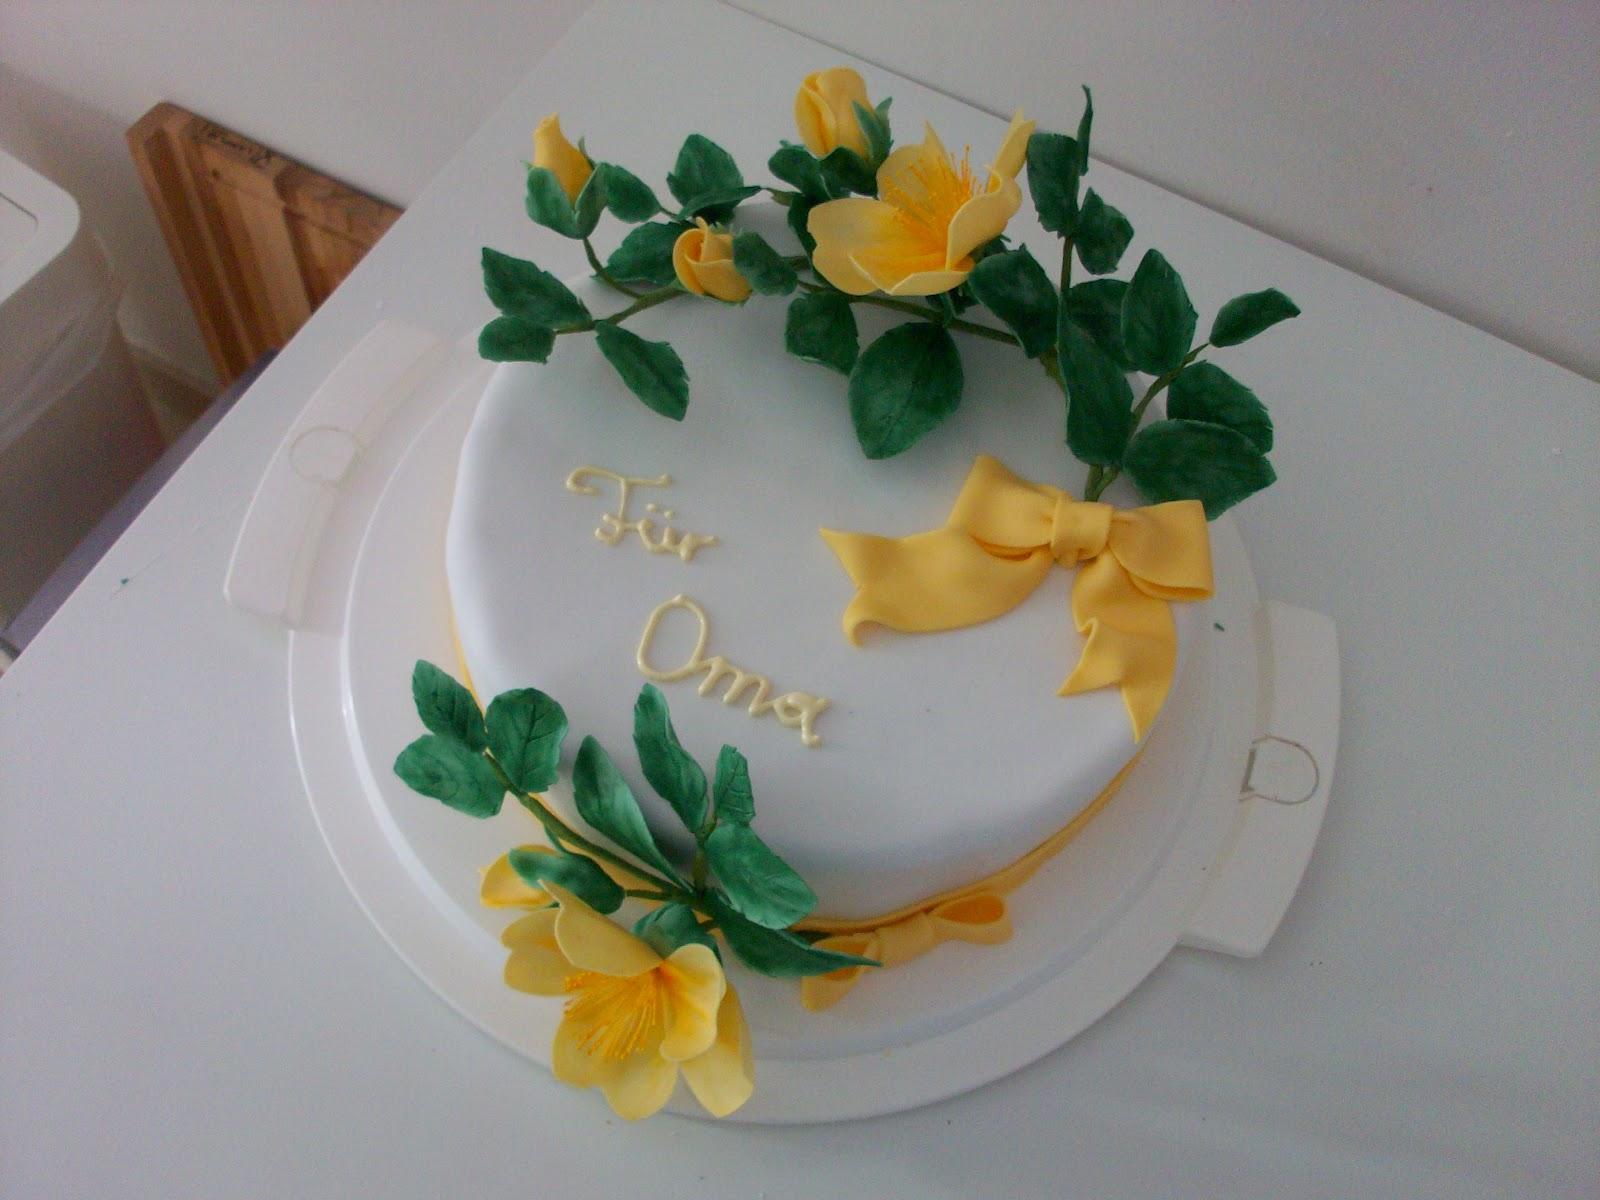 cake attack vienna rezept 2 omas geburtstagstorte pariser torte. Black Bedroom Furniture Sets. Home Design Ideas